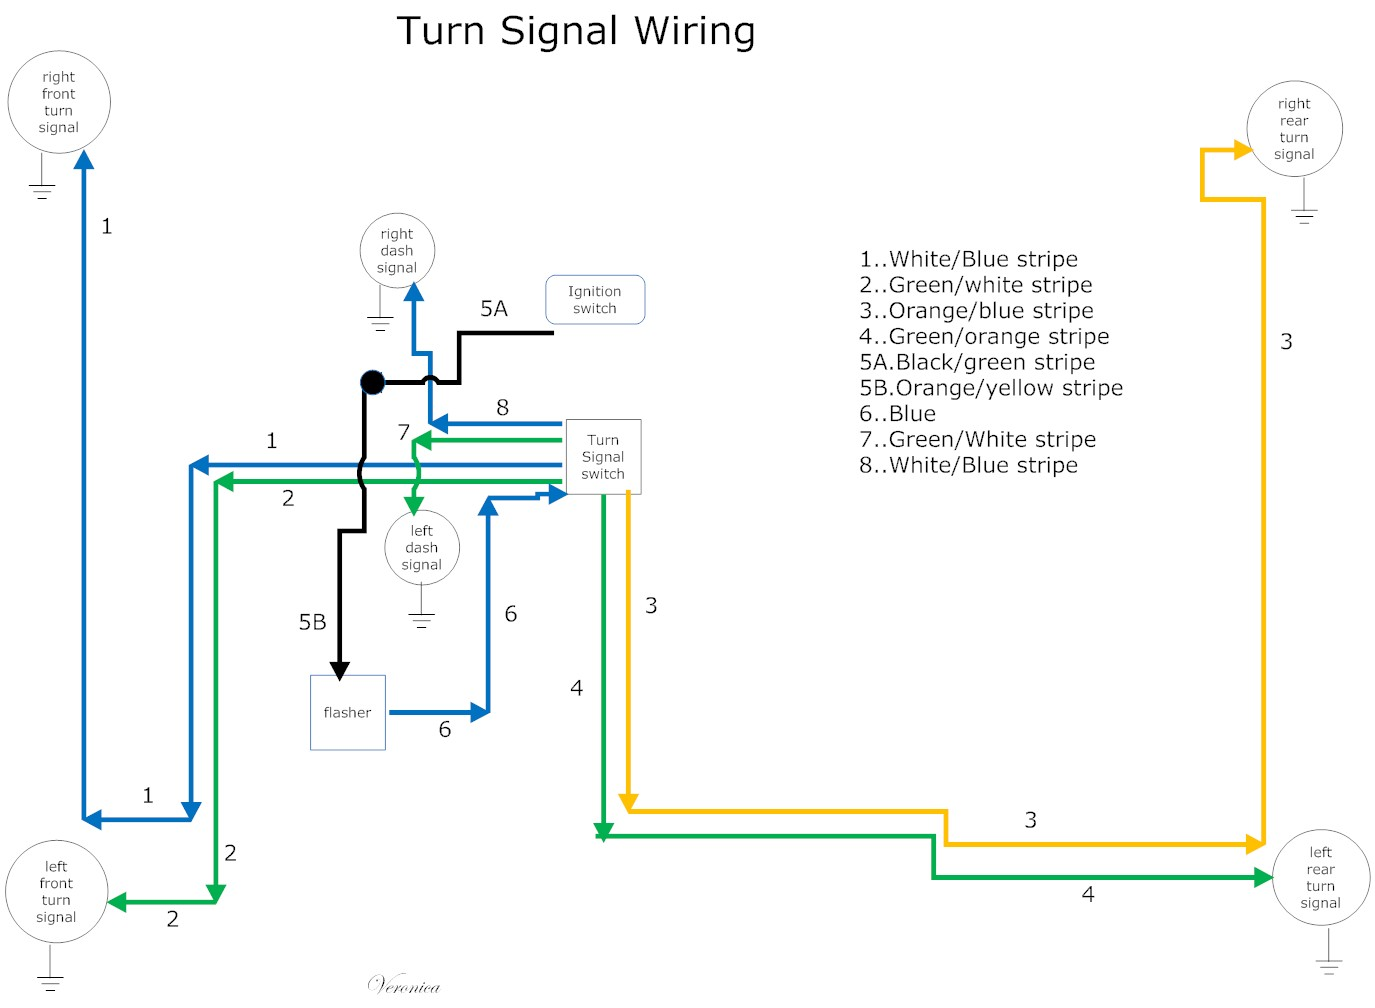 medium resolution of 2012 jeep wrangler turn signal wiring diagram somurich com rh somurich com jeep cj7 turn signal